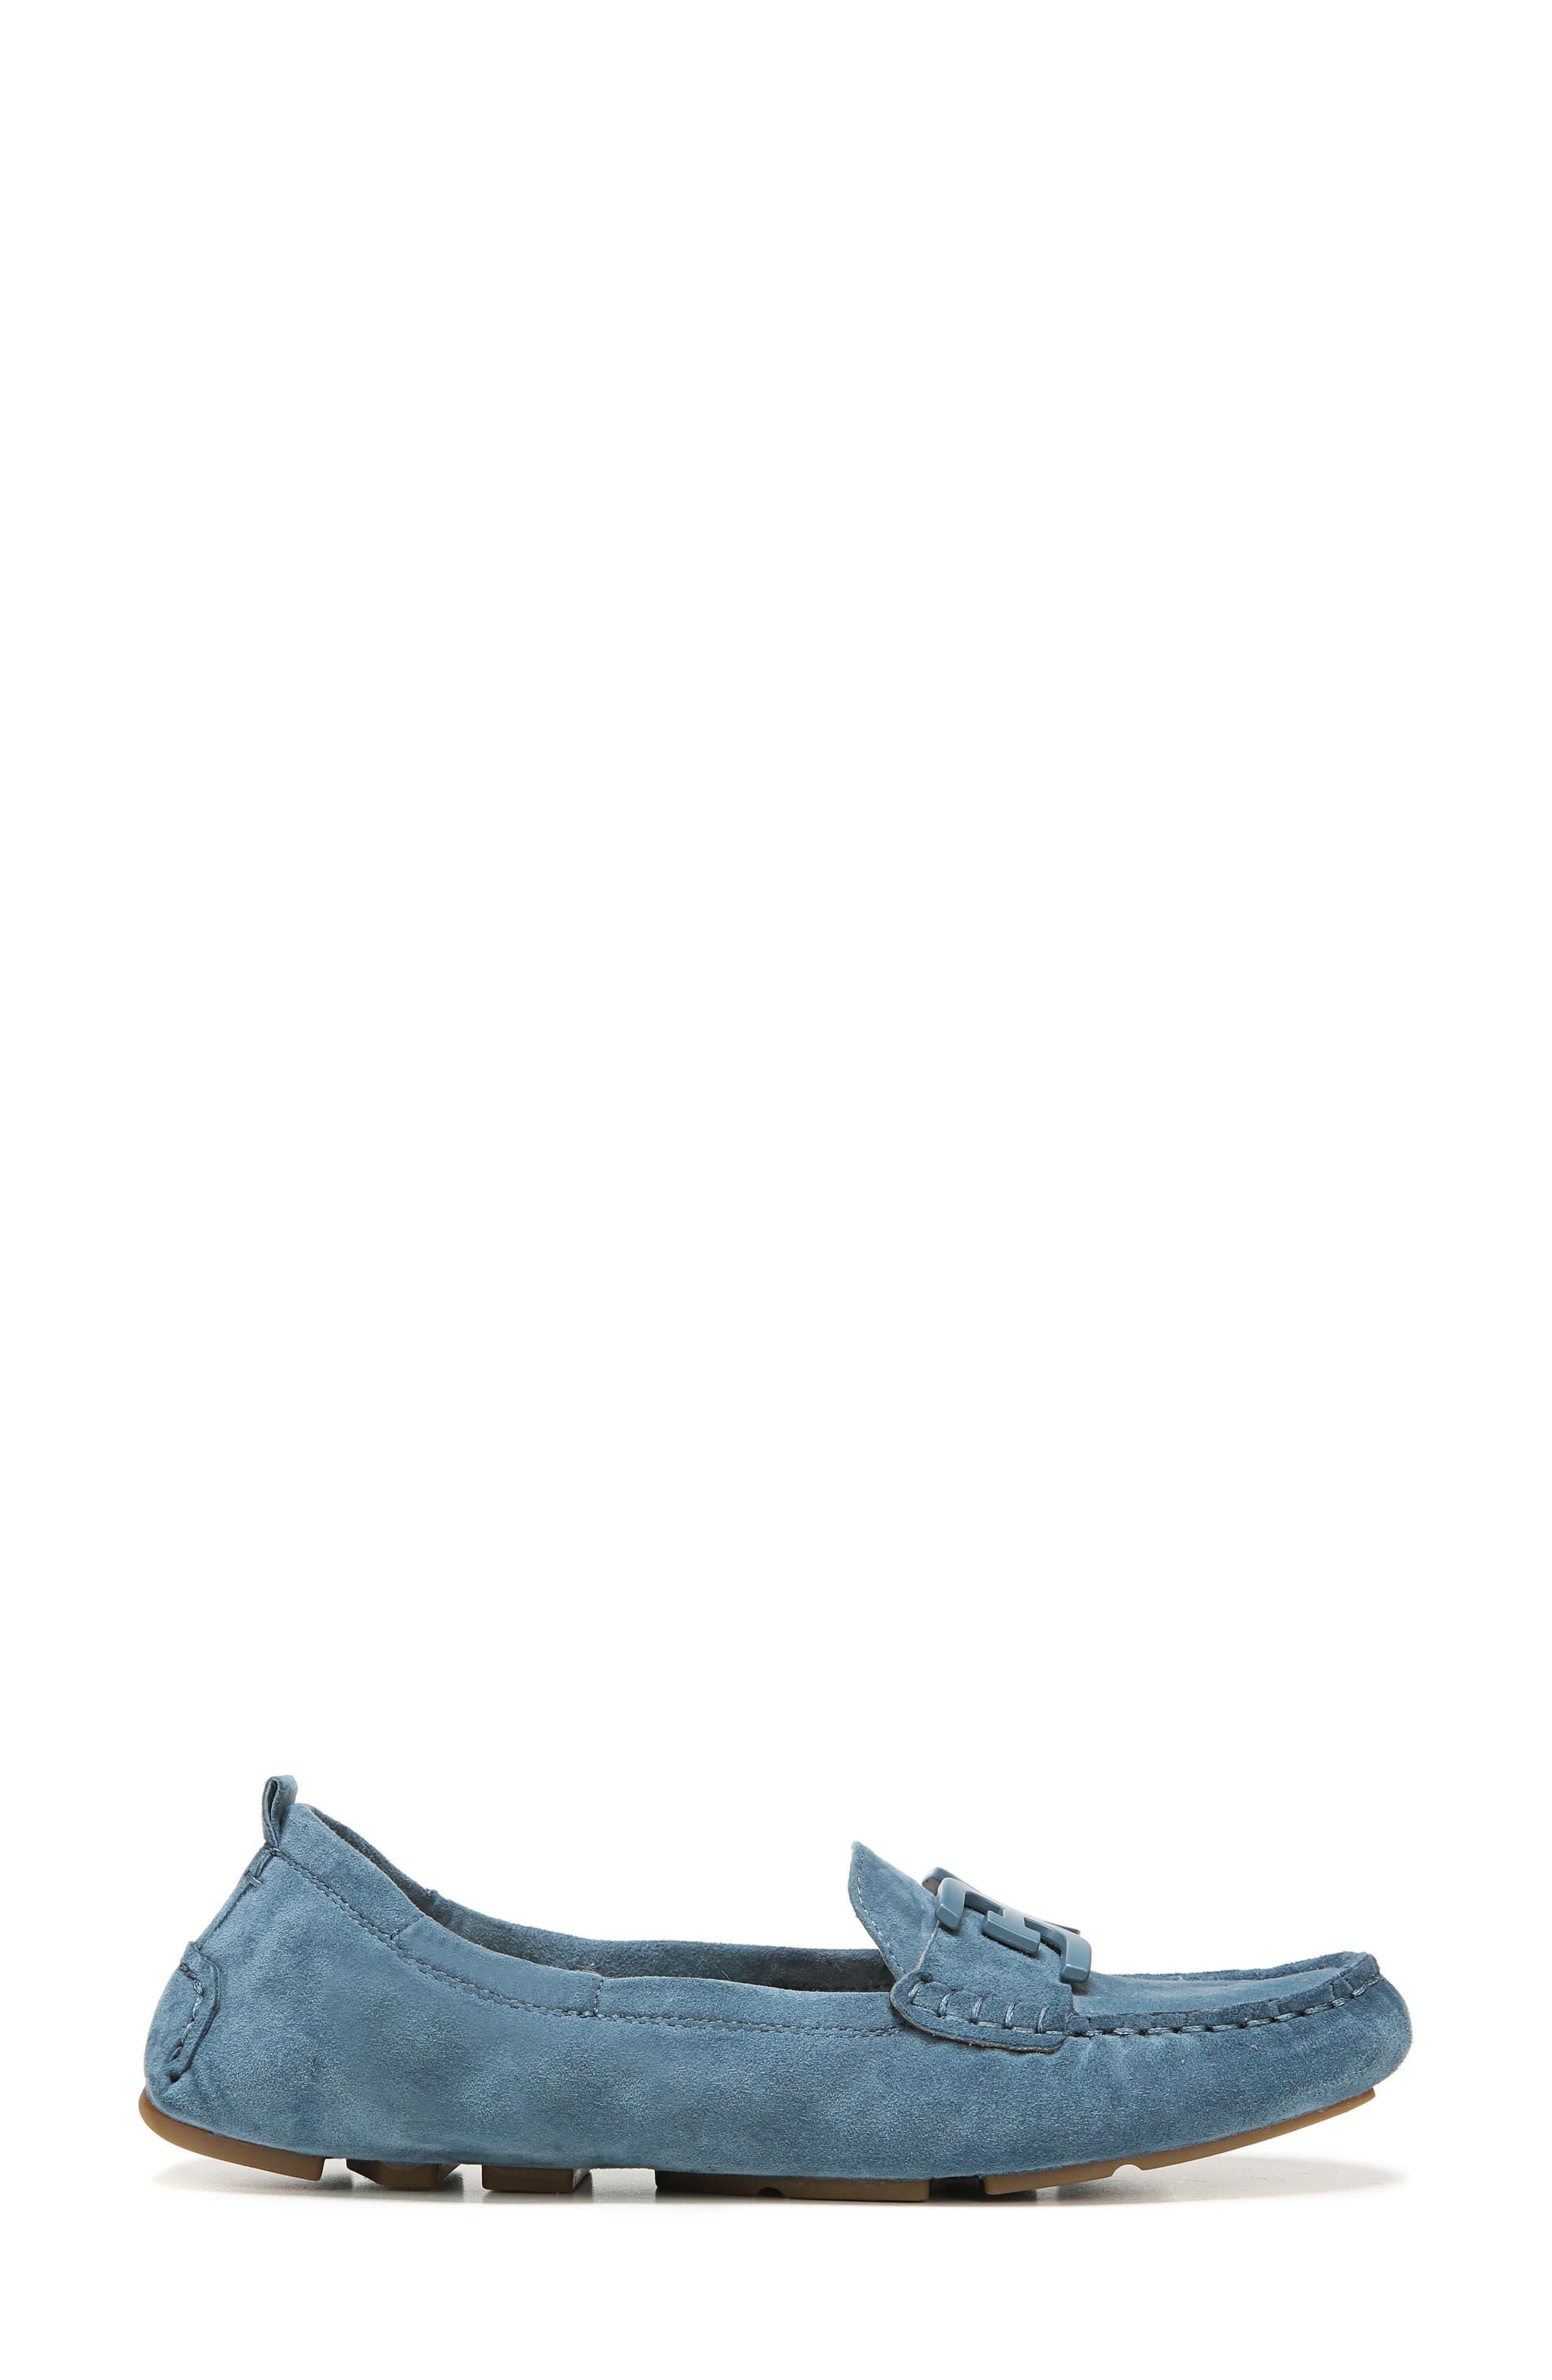 Farrell Moccasin Loafer,                             Alternate thumbnail 3, color,                             Denim Blue Suede